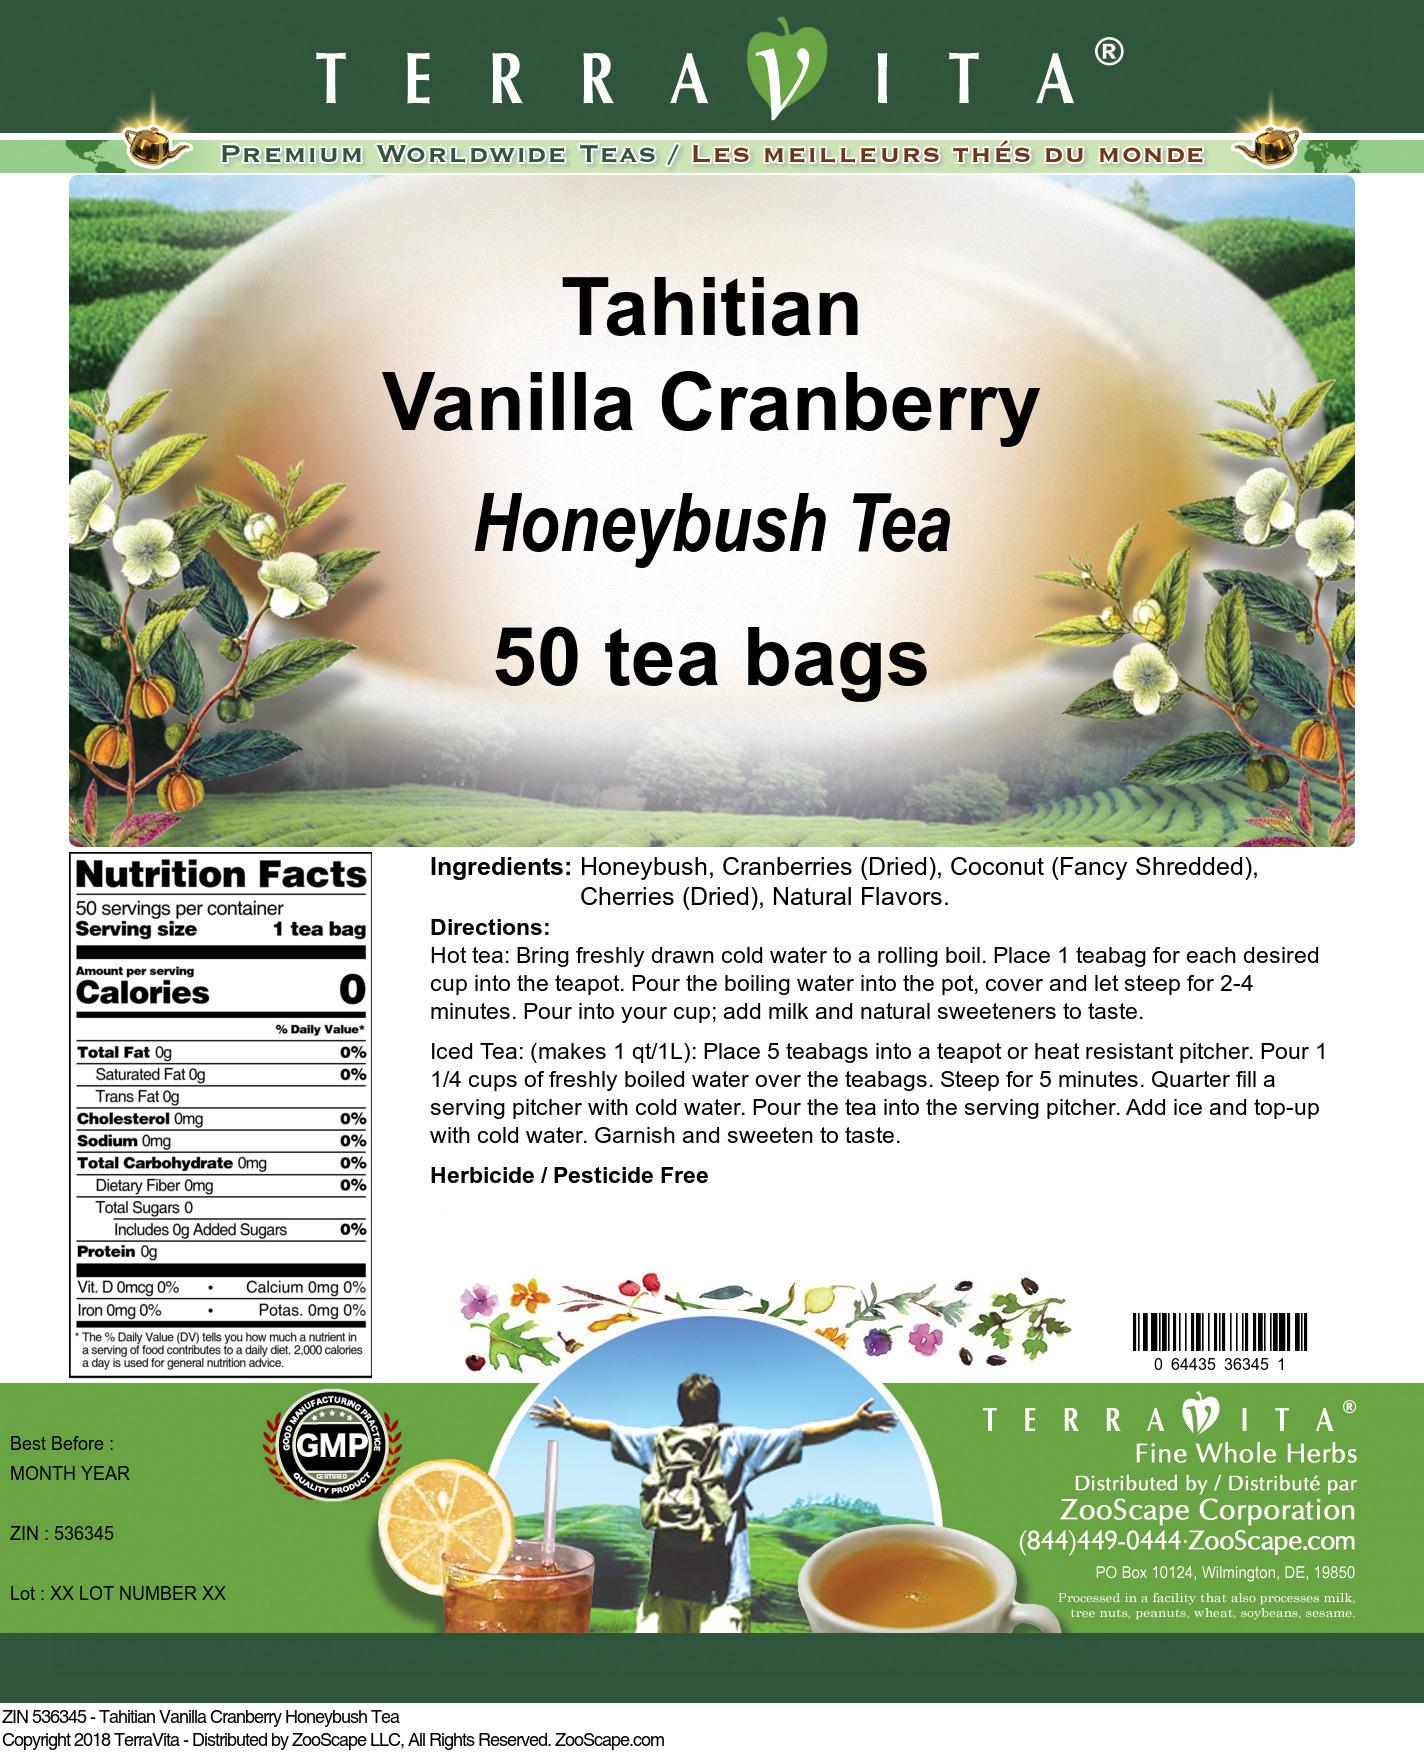 Tahitian Vanilla Cranberry Honeybush Tea